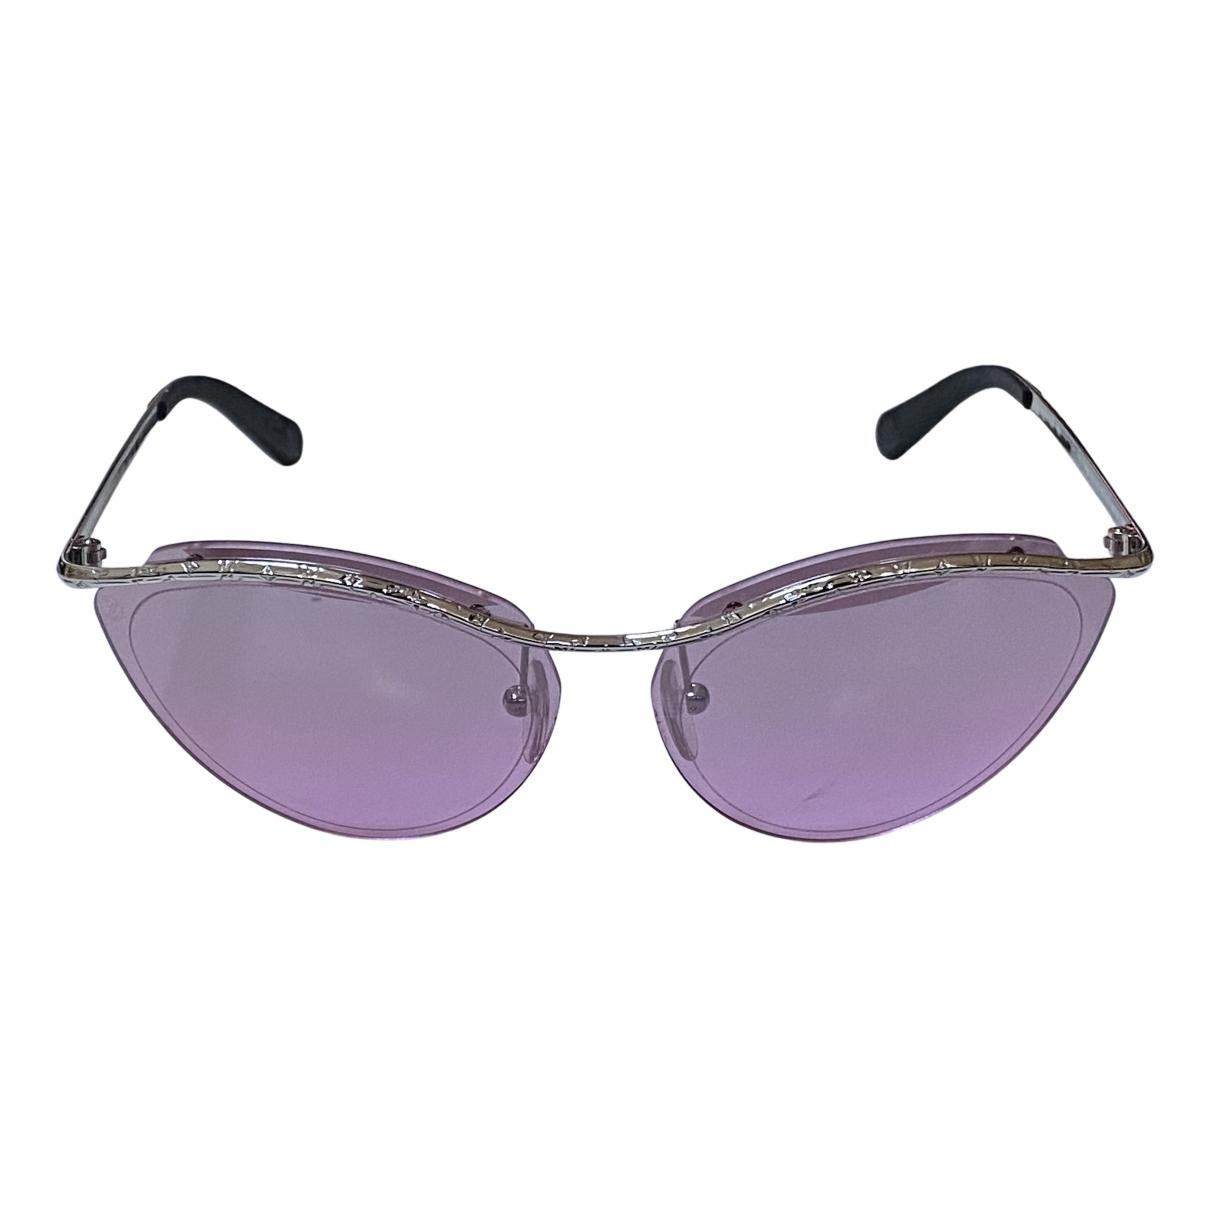 Louis Vuitton N Pink Metal Sunglasses for Women N